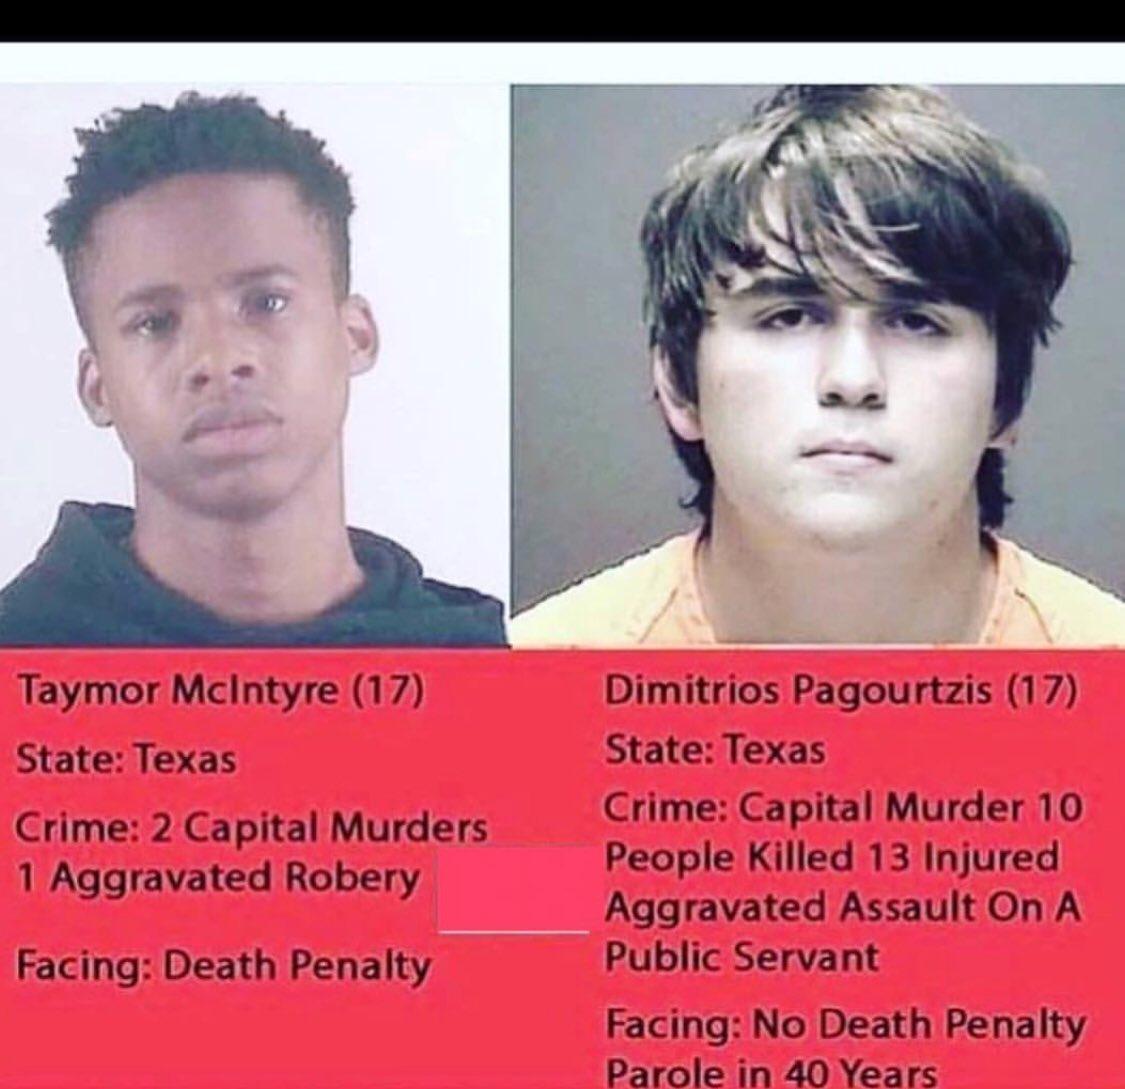 Florida School Shooting (here We Go Again)